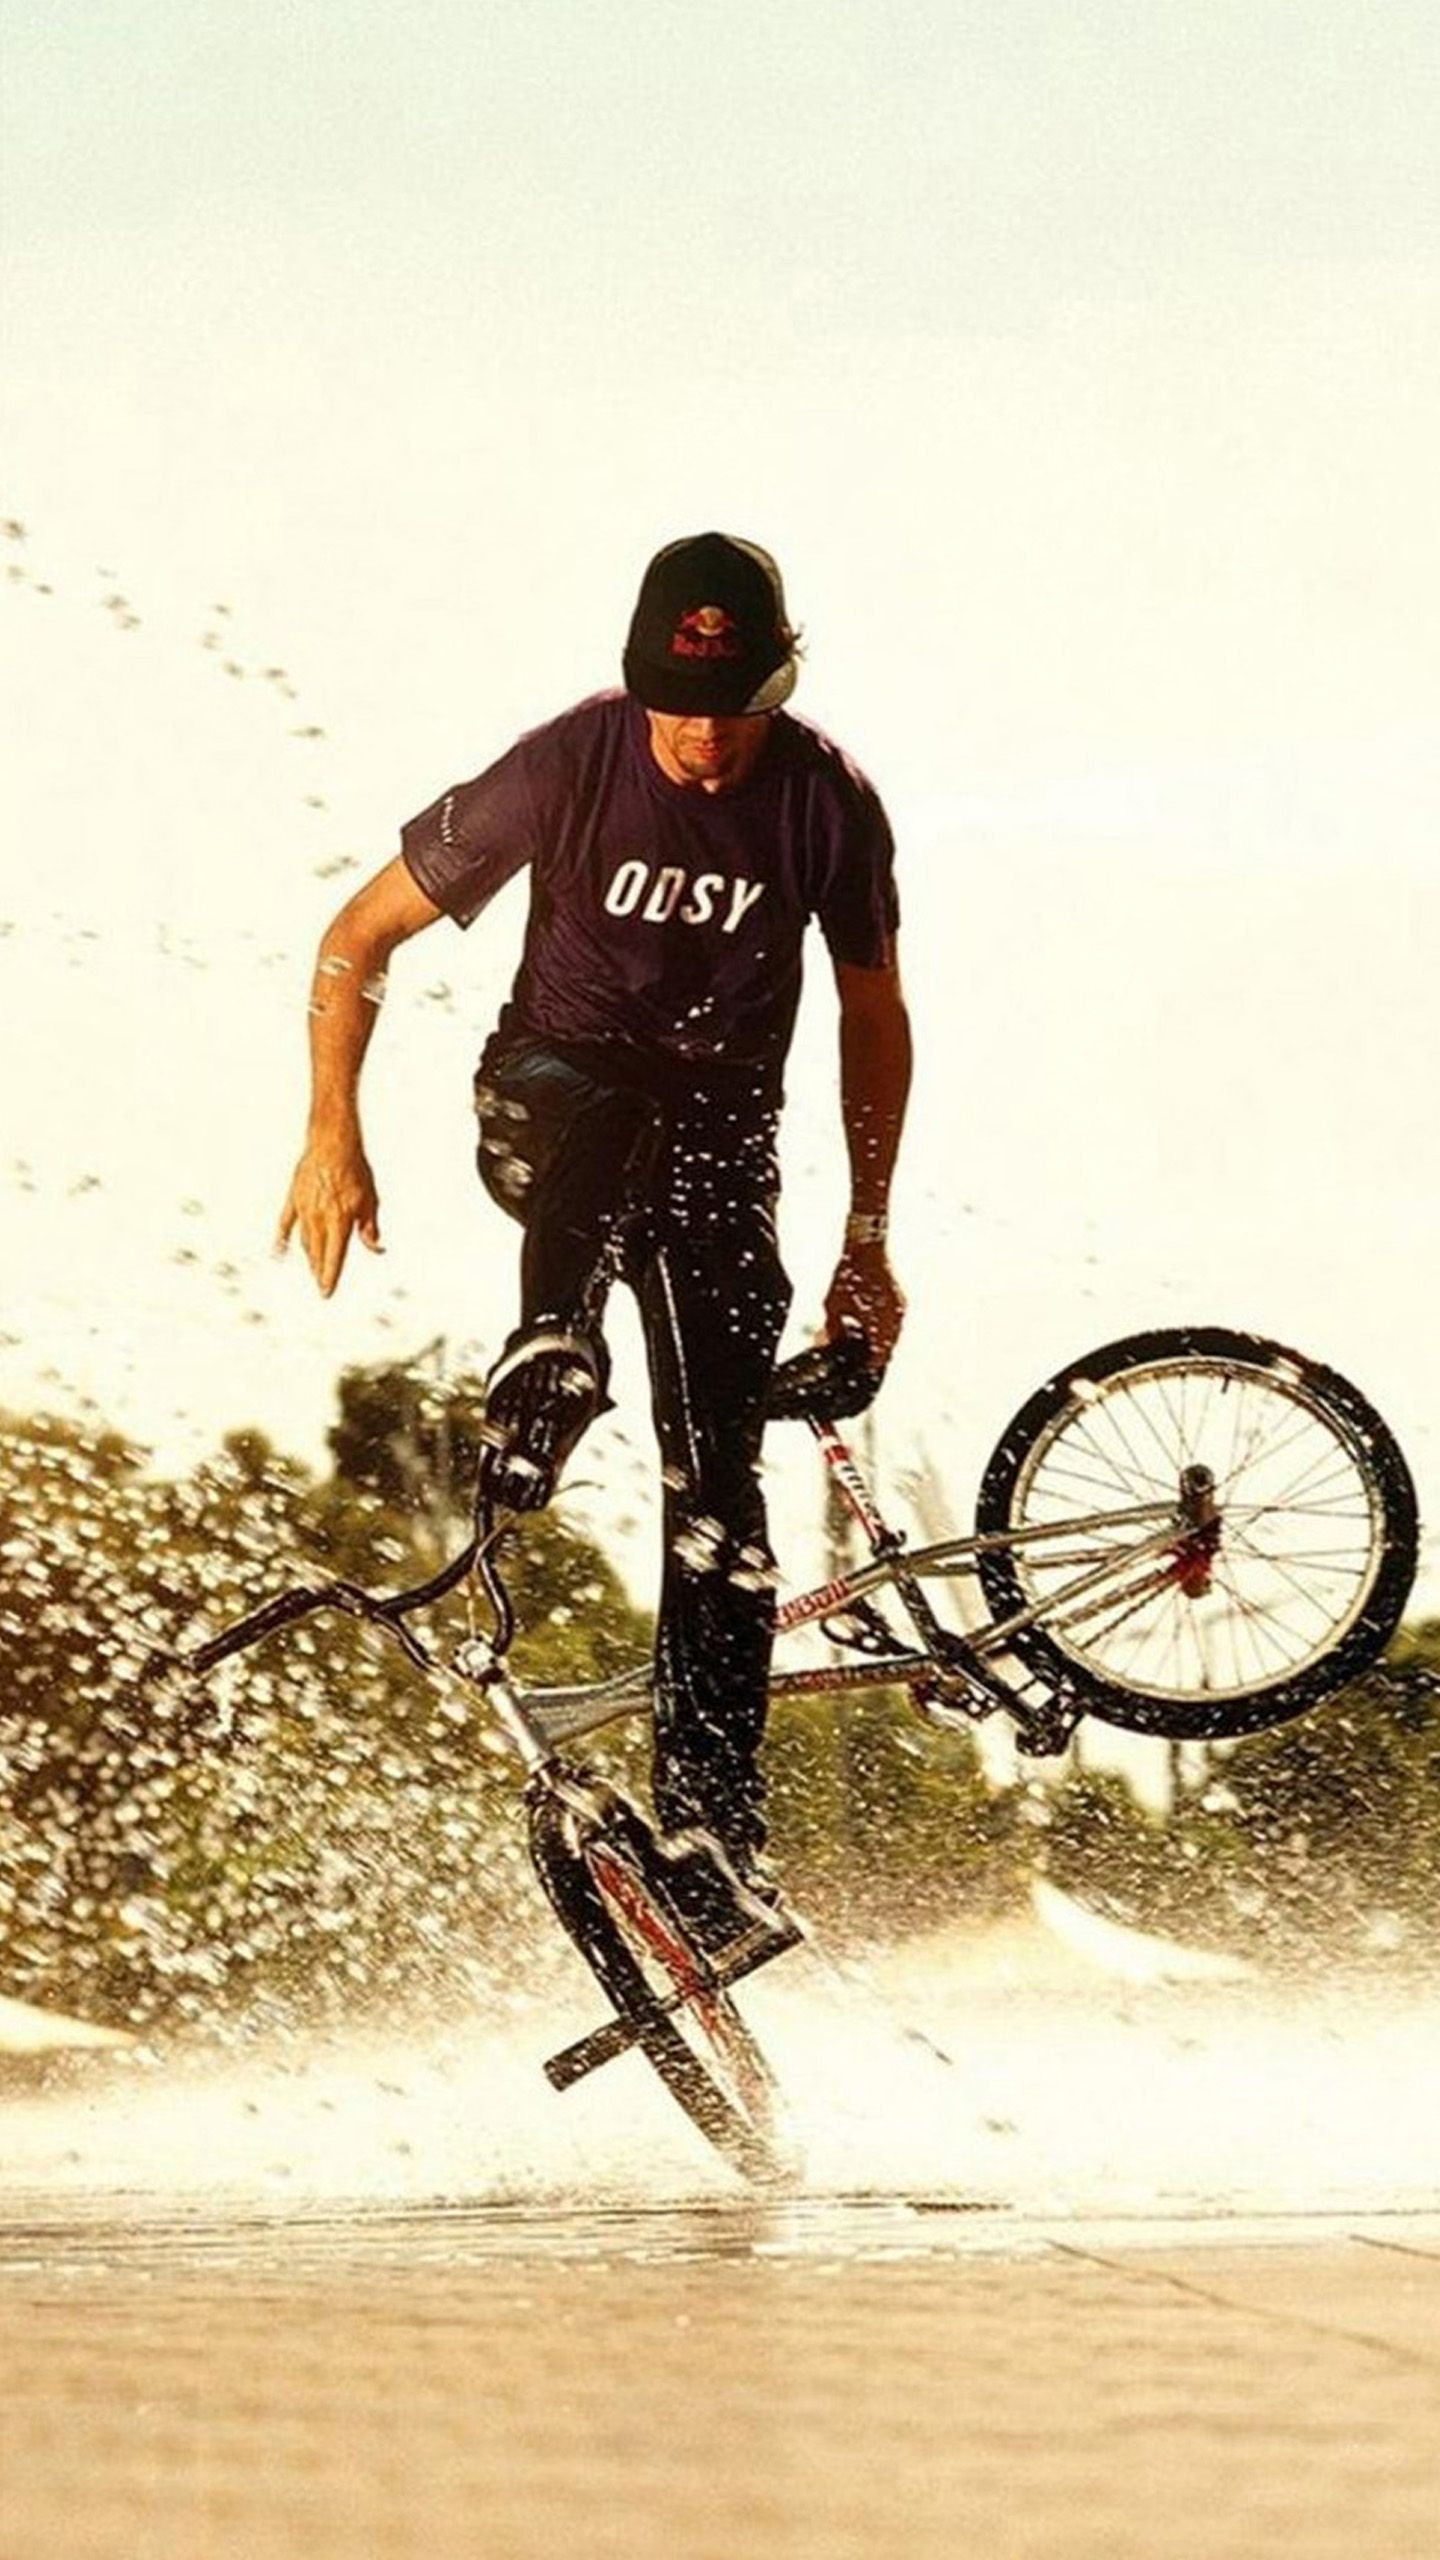 Bike Stunt Hd Wallpaper For Mobile Stunt Bmxer Biker Biking Bmx Xgames Galaxy S6